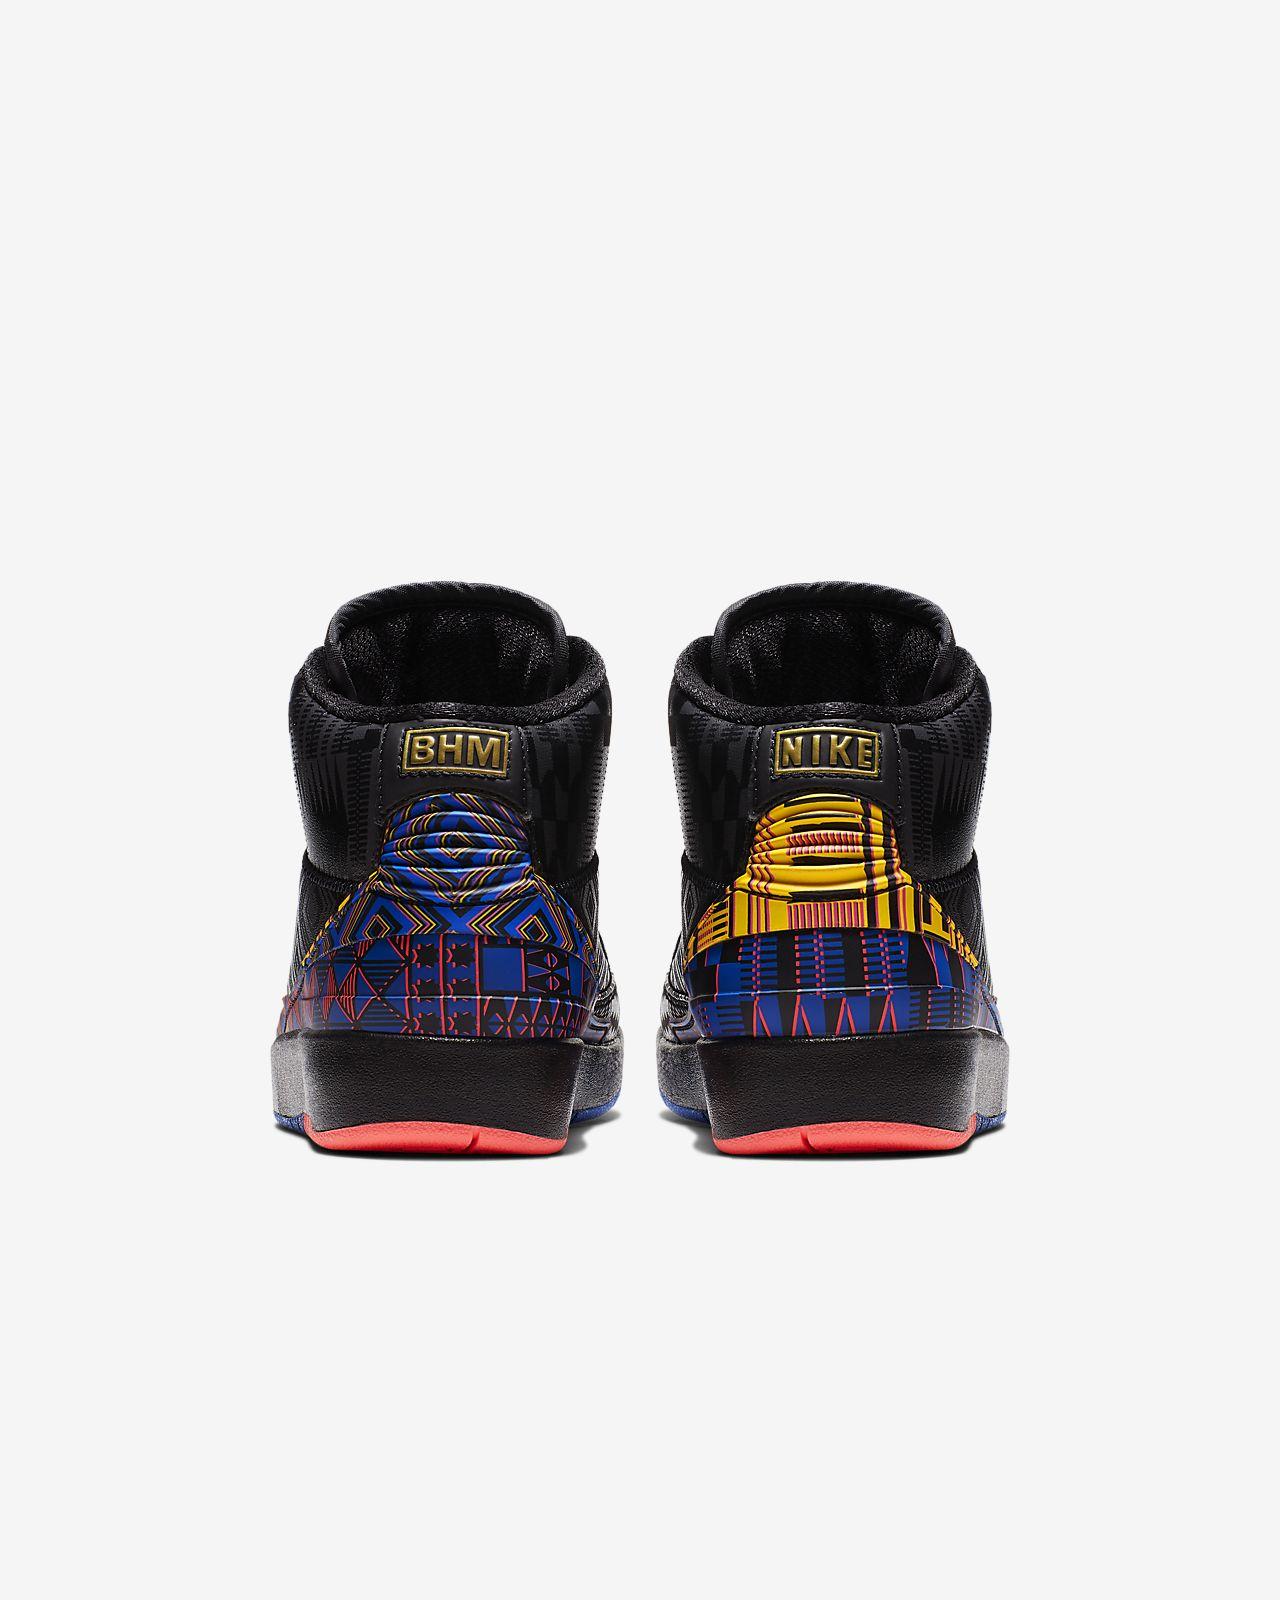 b0652cdd5d25 Air Jordan 2 Retro BHM Big Kids  Shoe. Nike.com